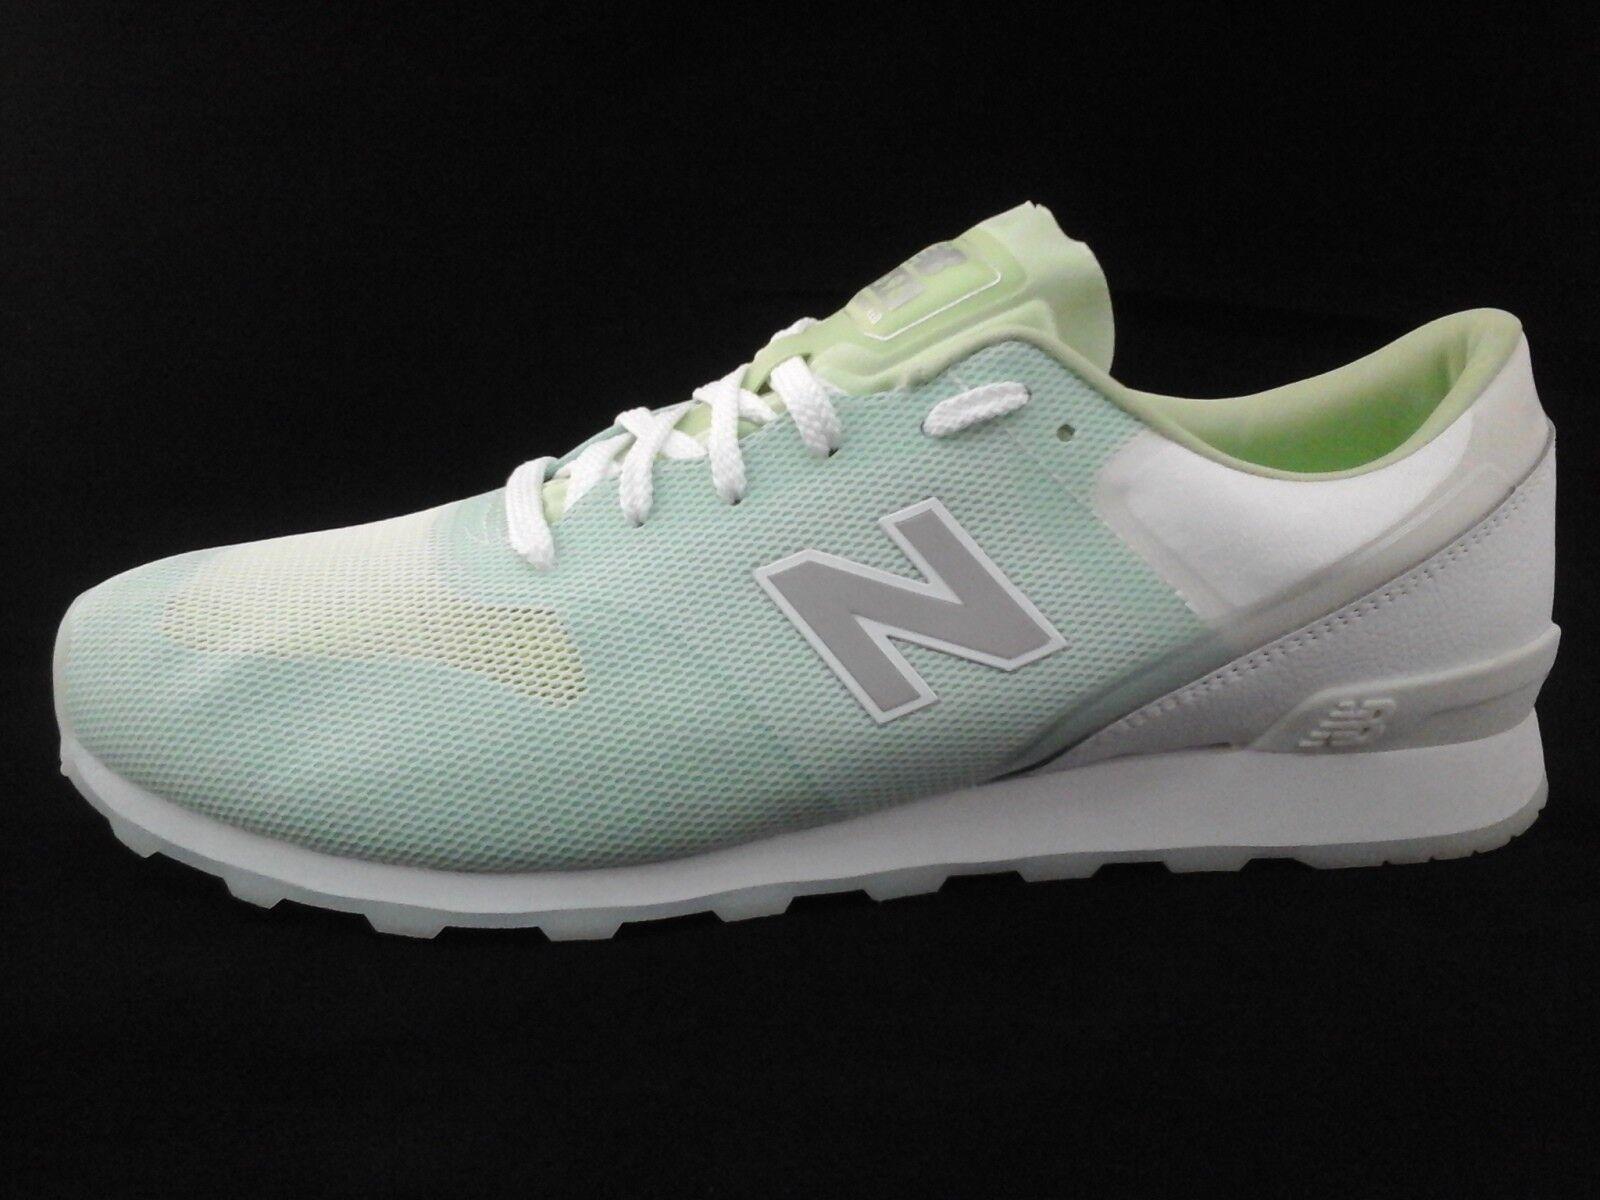 New Balance WL696RBM 696 Women's Running Silver Mint Shoes US 12